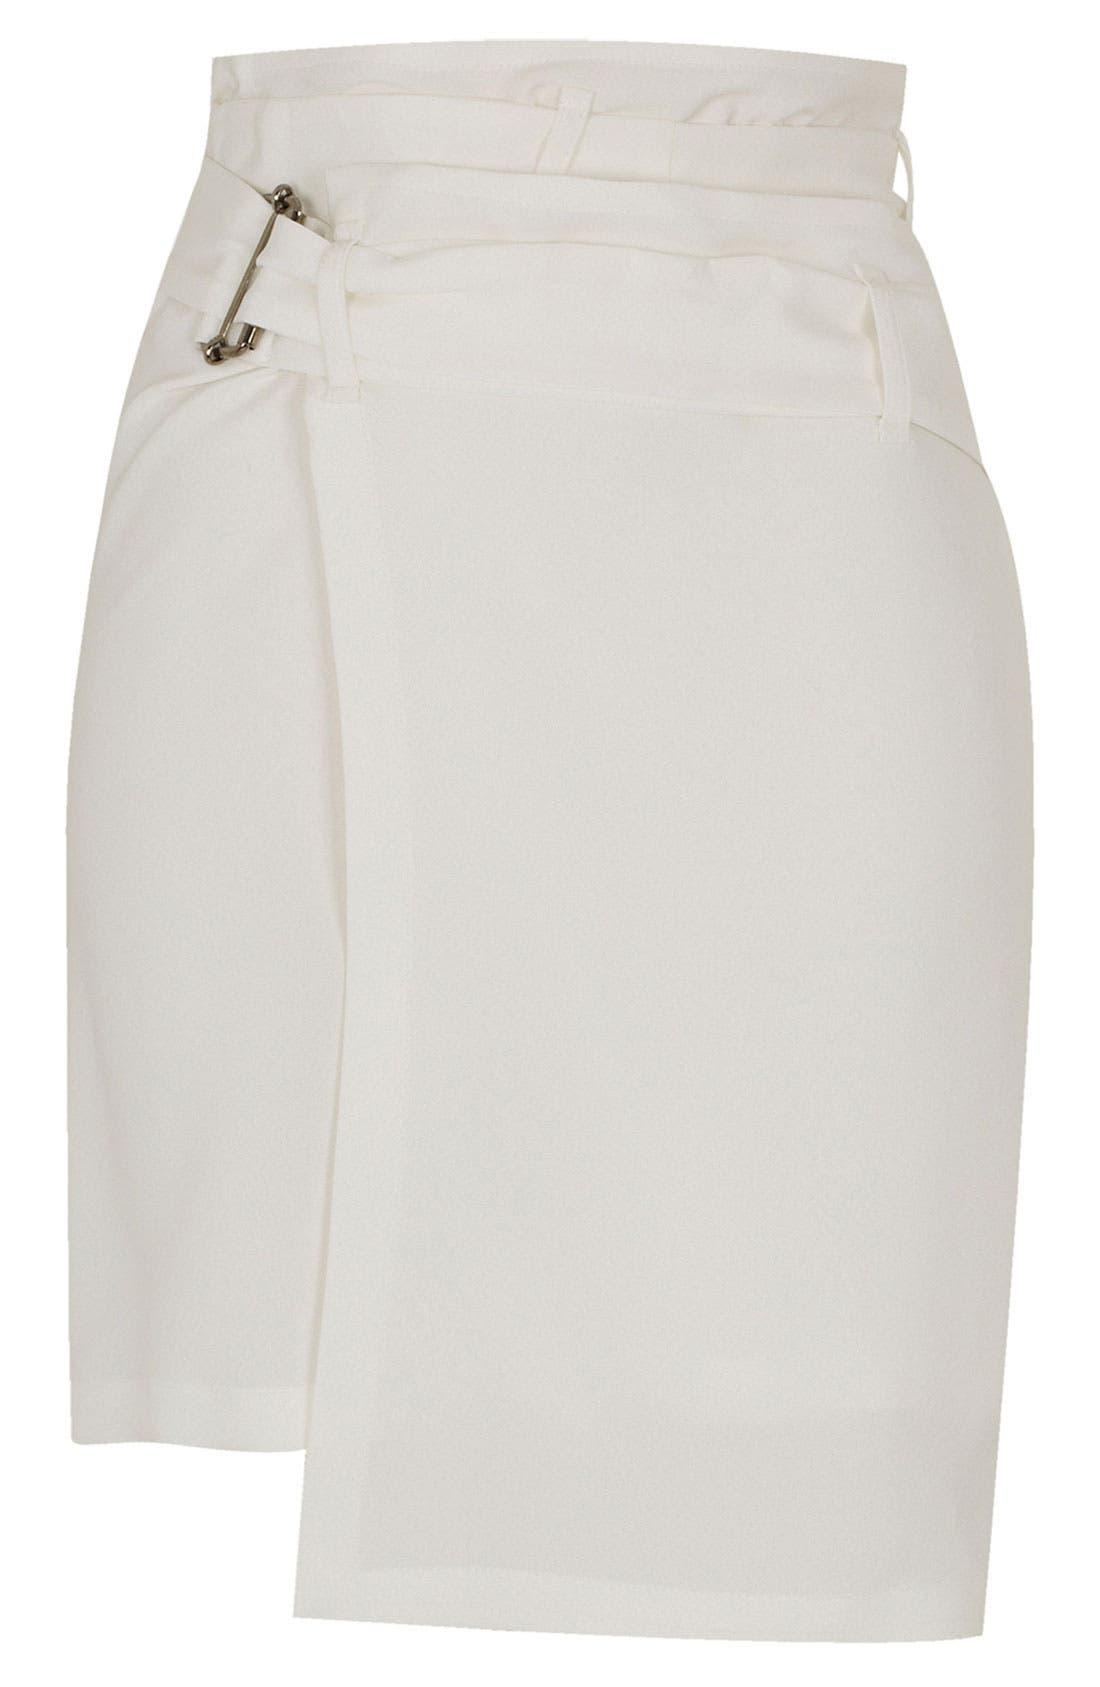 Alternate Image 1 Selected - Topshop Unique Silk Asymmetrical Wrap Skirt